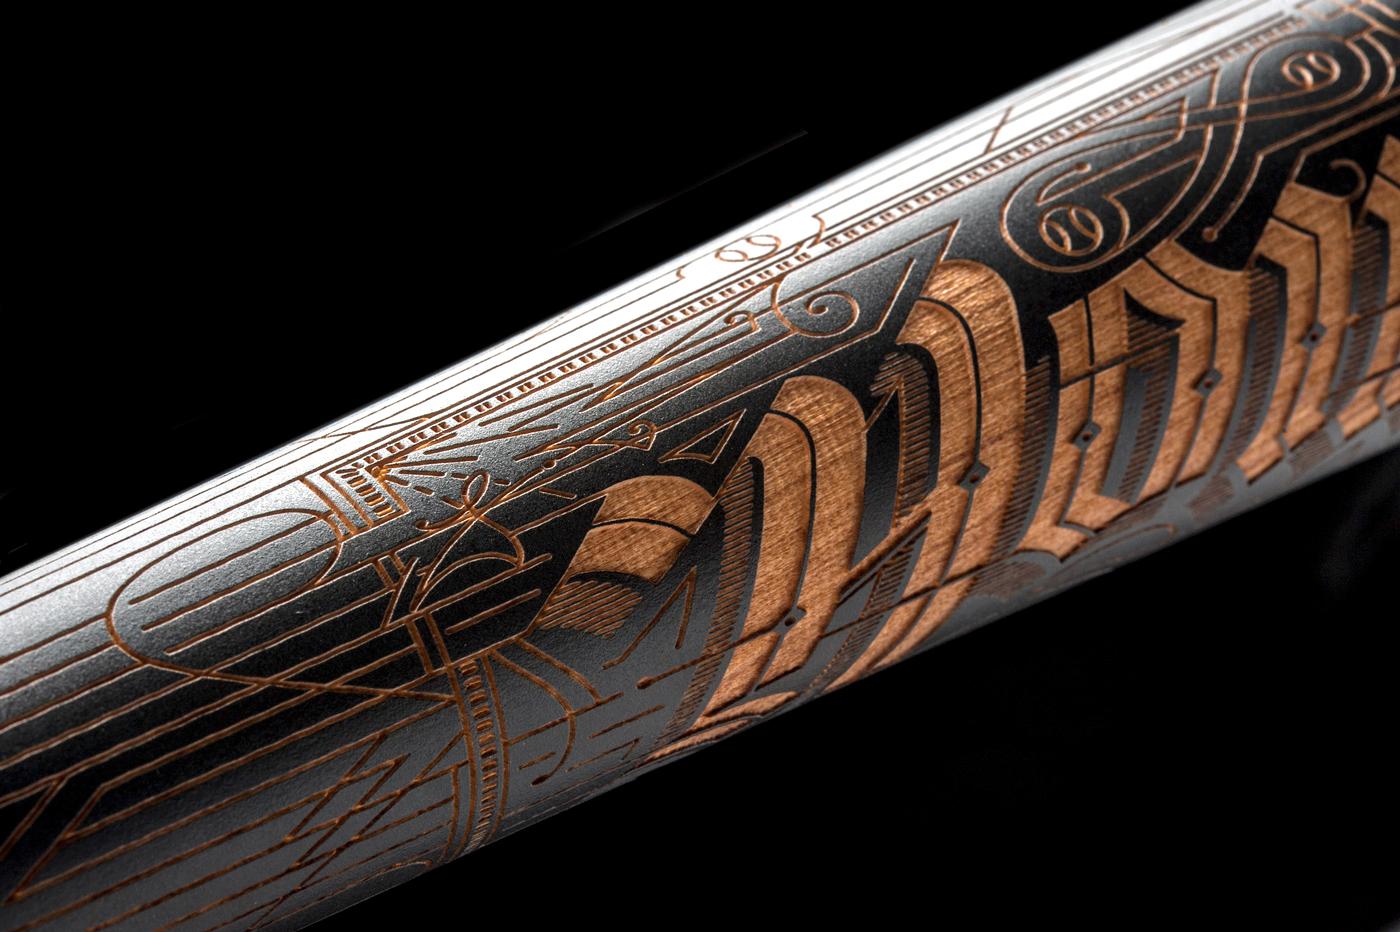 Nike perfect game All American Classic Home Run King baseball nike baseball laser etching Victorian Graffiti